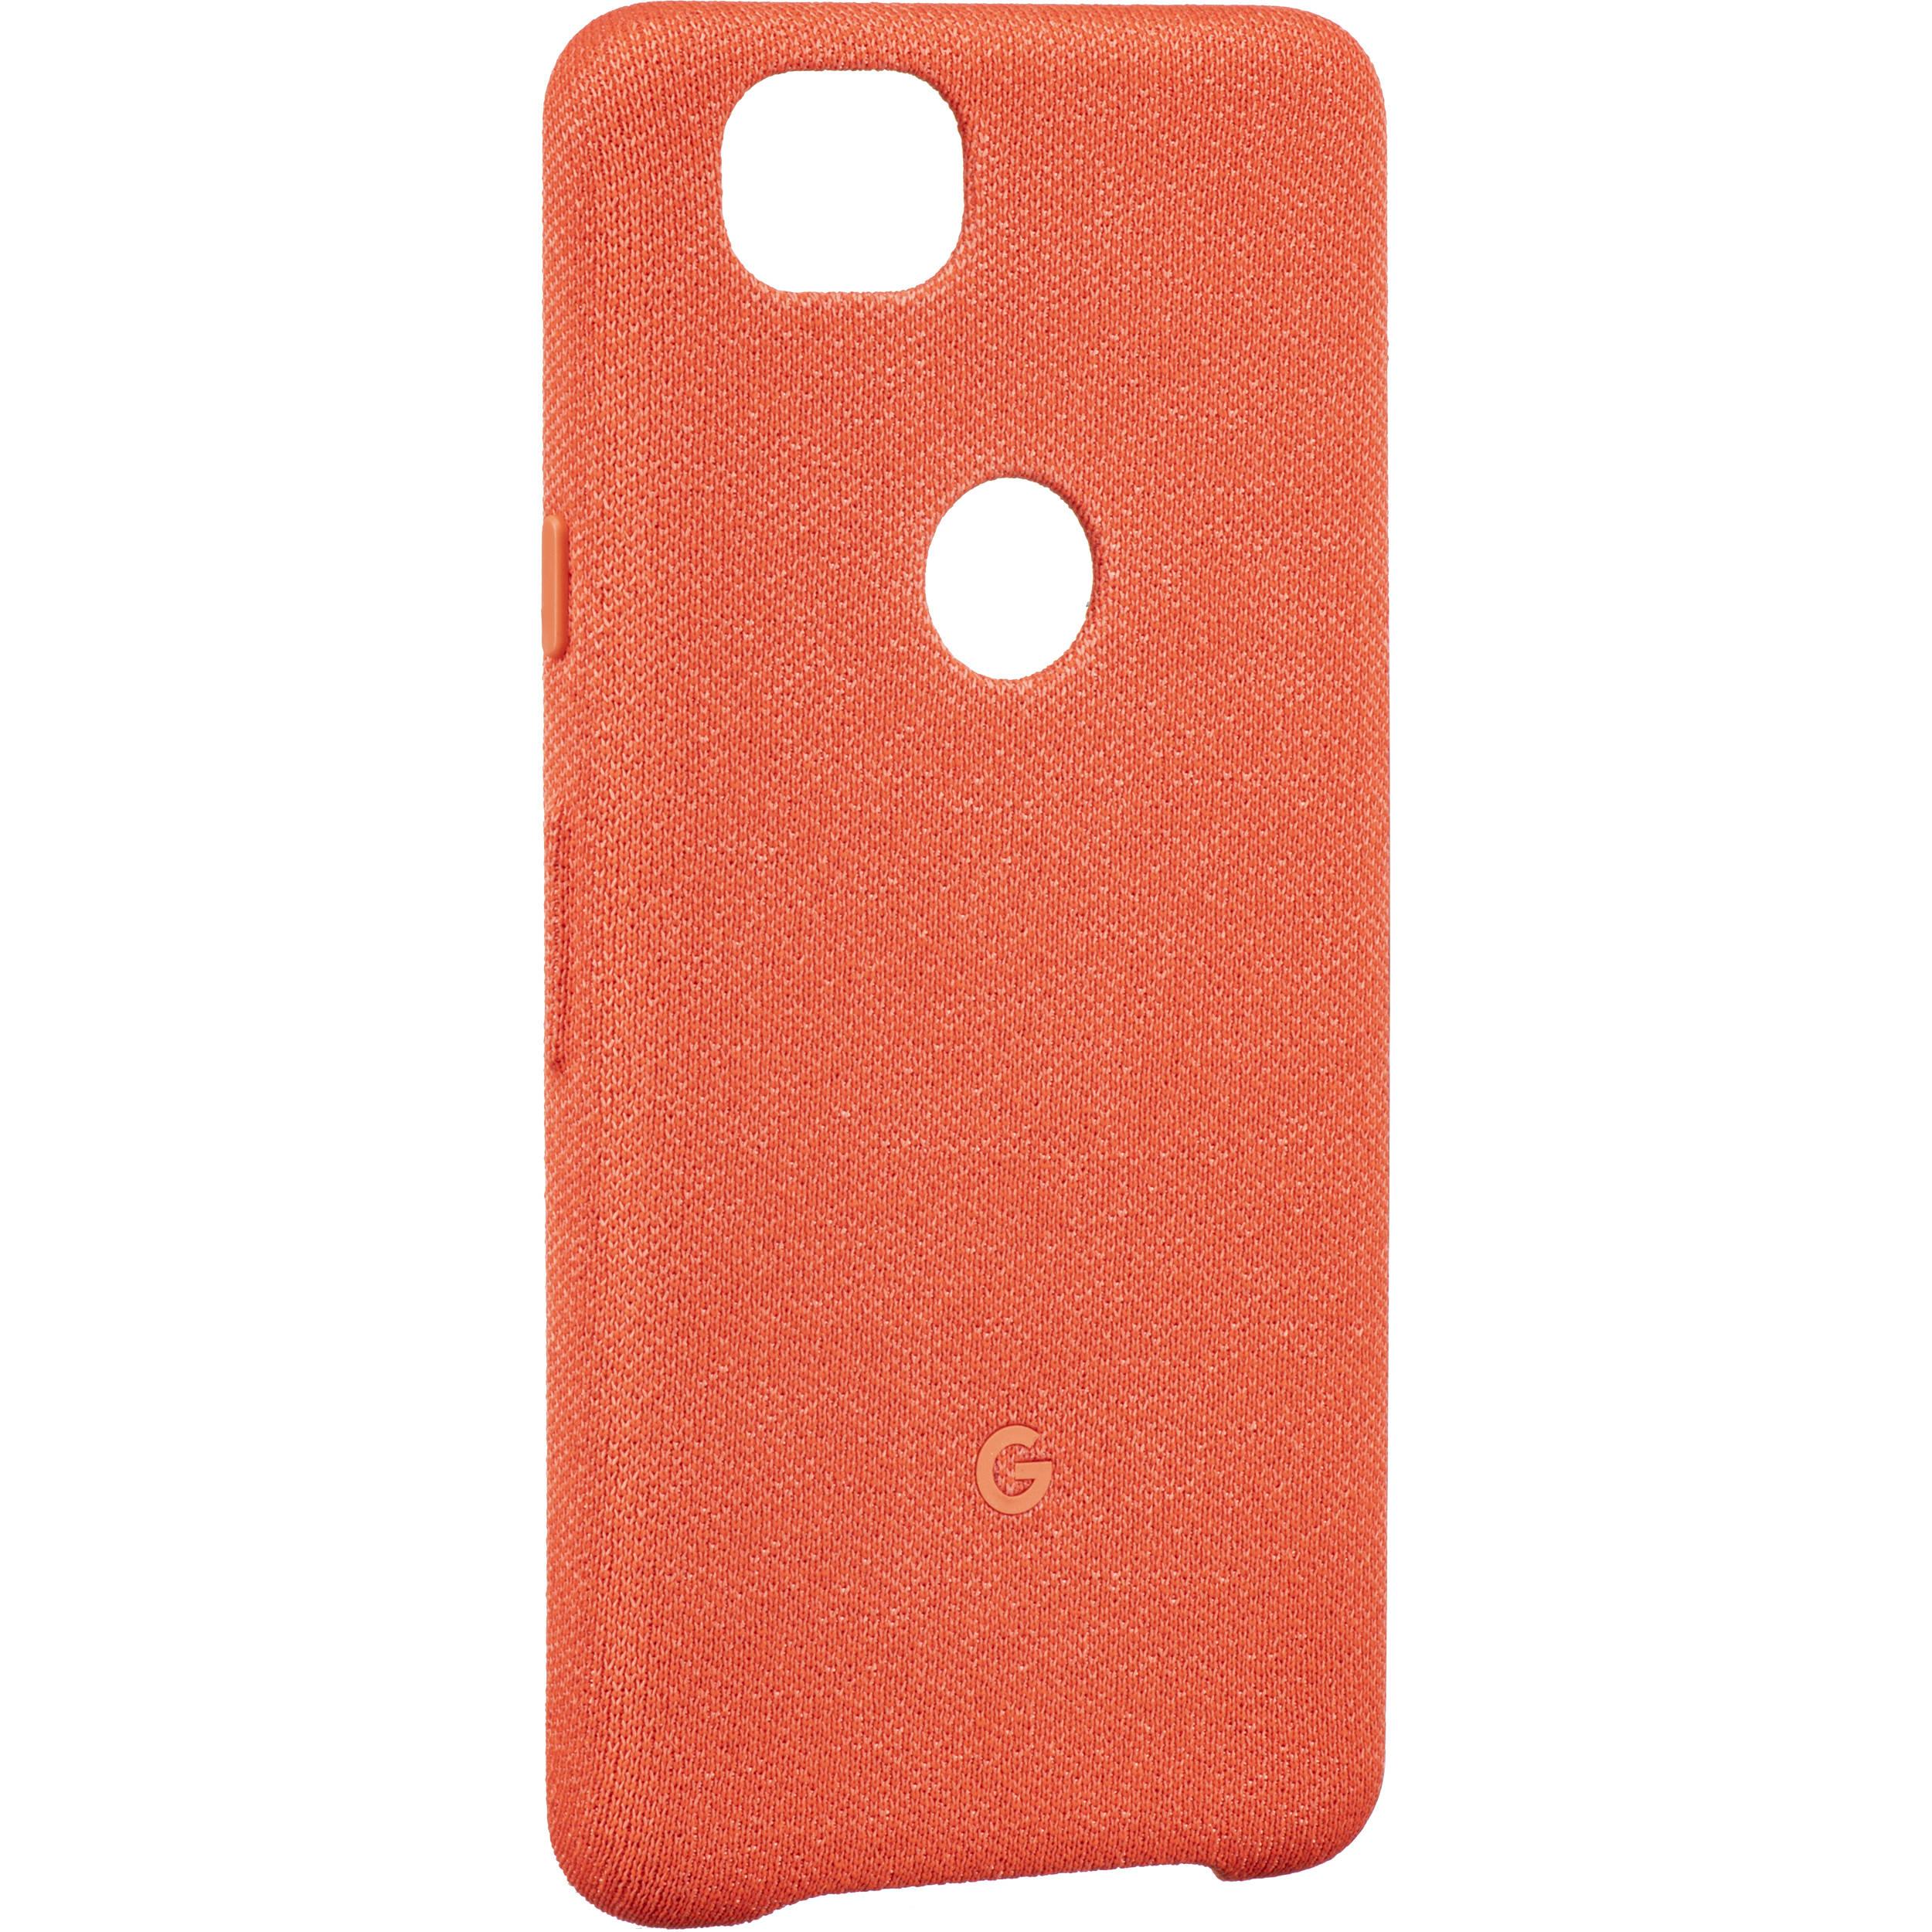 527869f326b0 Google Pixel 2 Fabric Case (Coral) GA00162 B H Photo Video